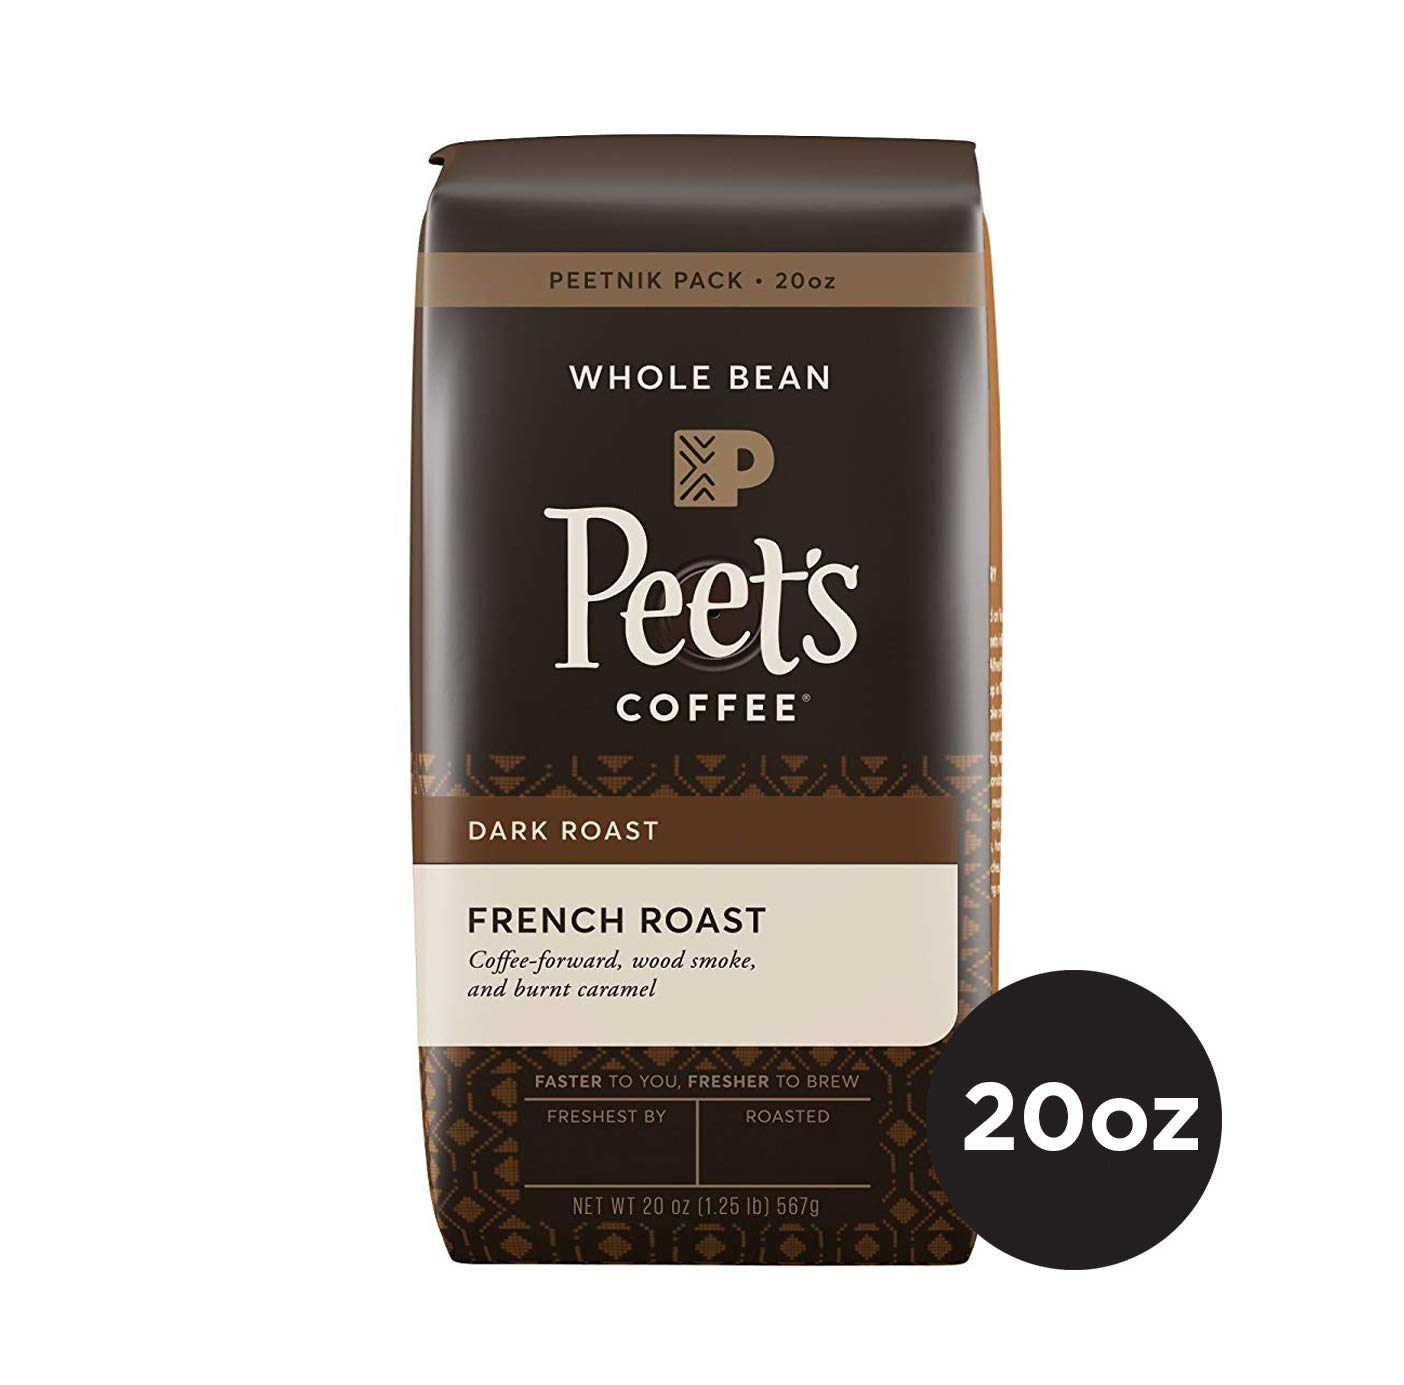 Peet's Coffee French Roast, Dark Roast Whole Bean Coffee, 20 Ounce Peetnik Pack, Direct Trade Coffee